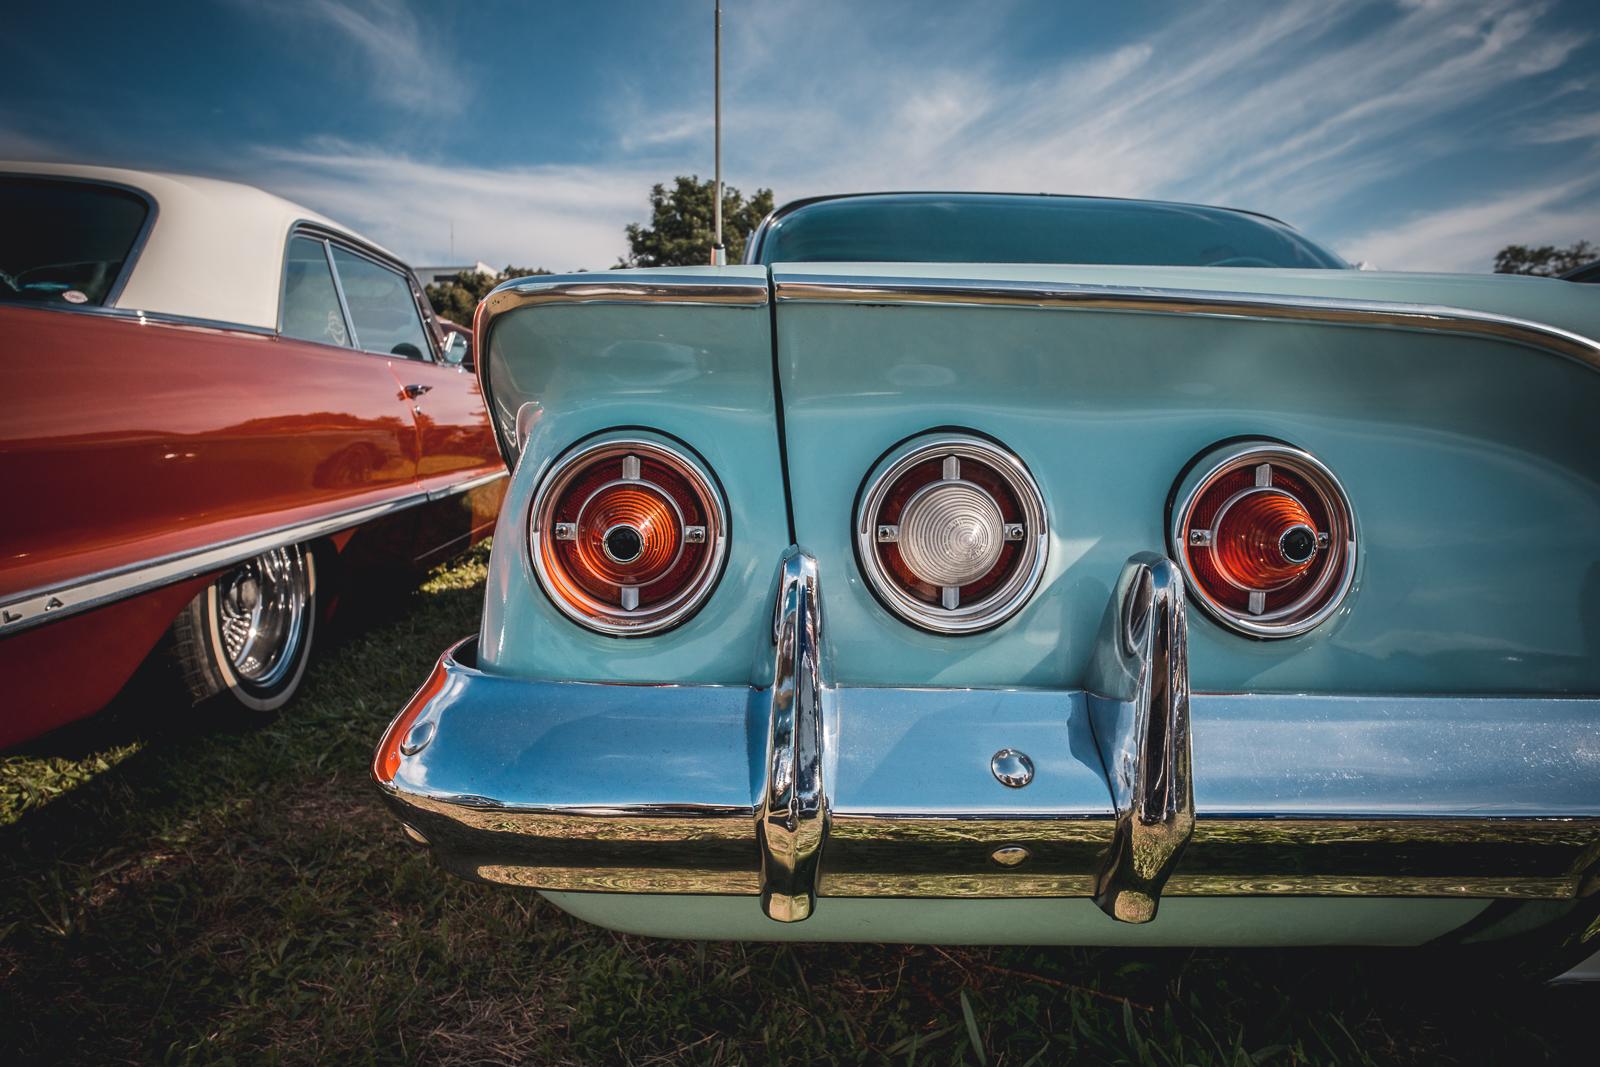 1961 Chevrolet Impala back